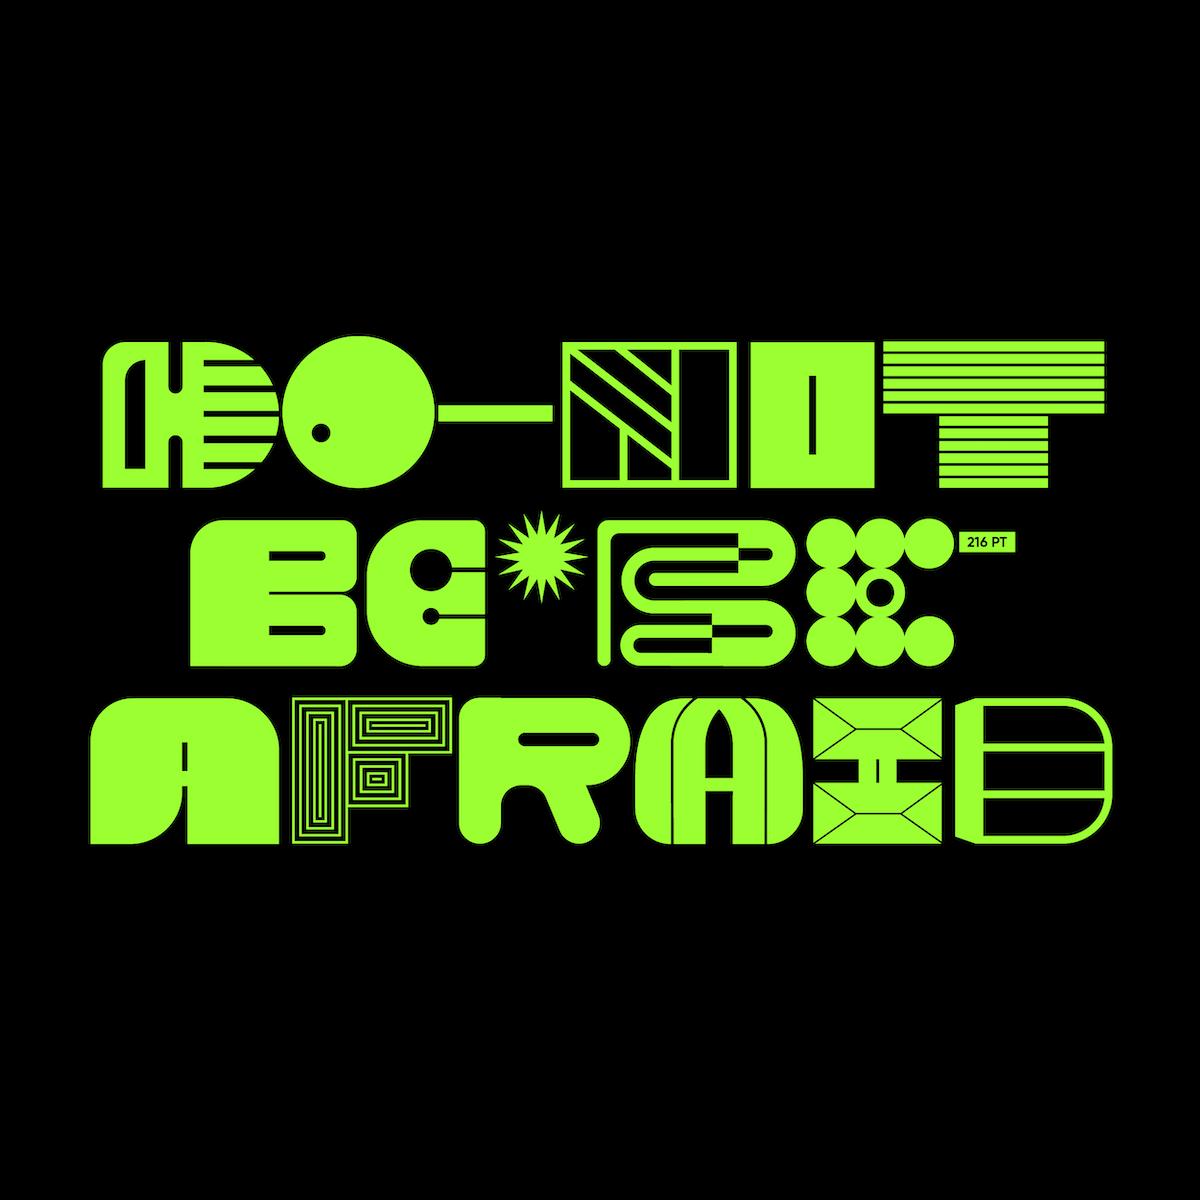 Cleo font: Do Not Be Afraid